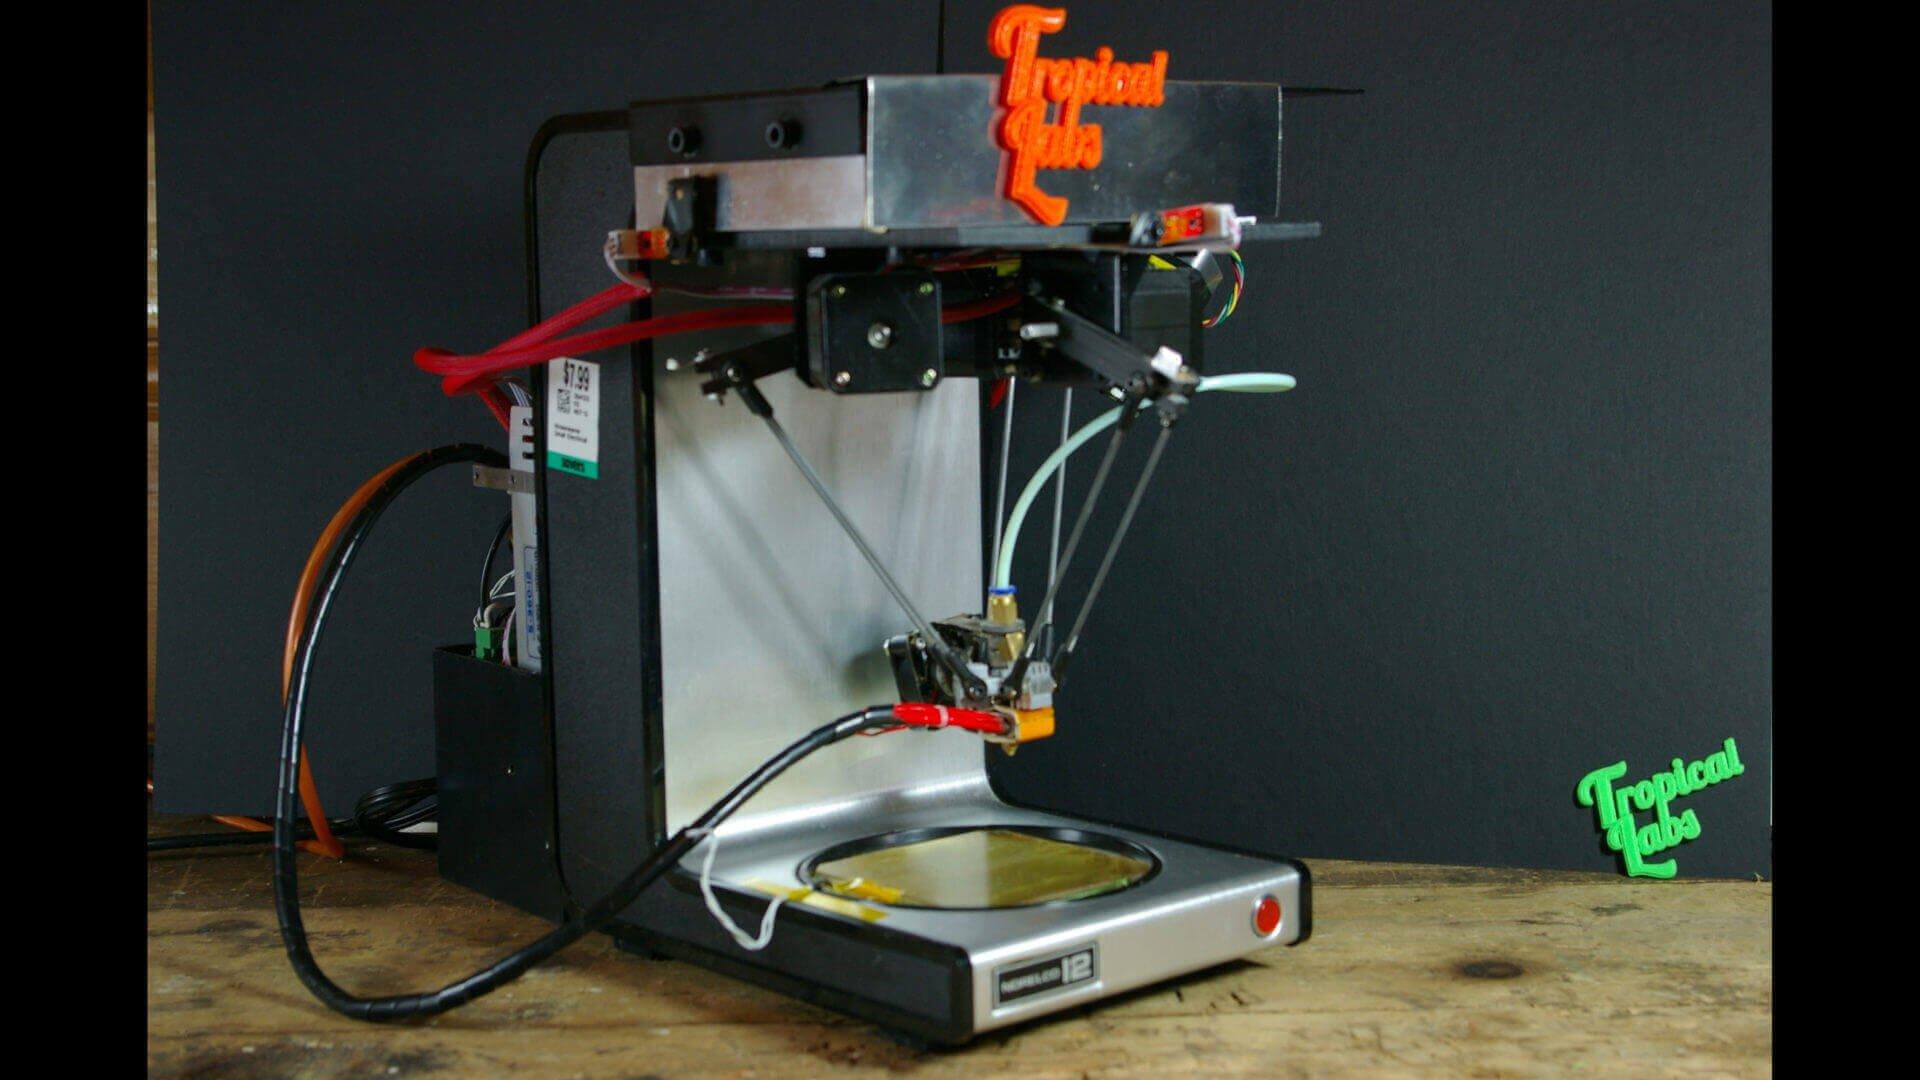 Coffee Maker Transformed into a Delta 3D Printer | All3DP